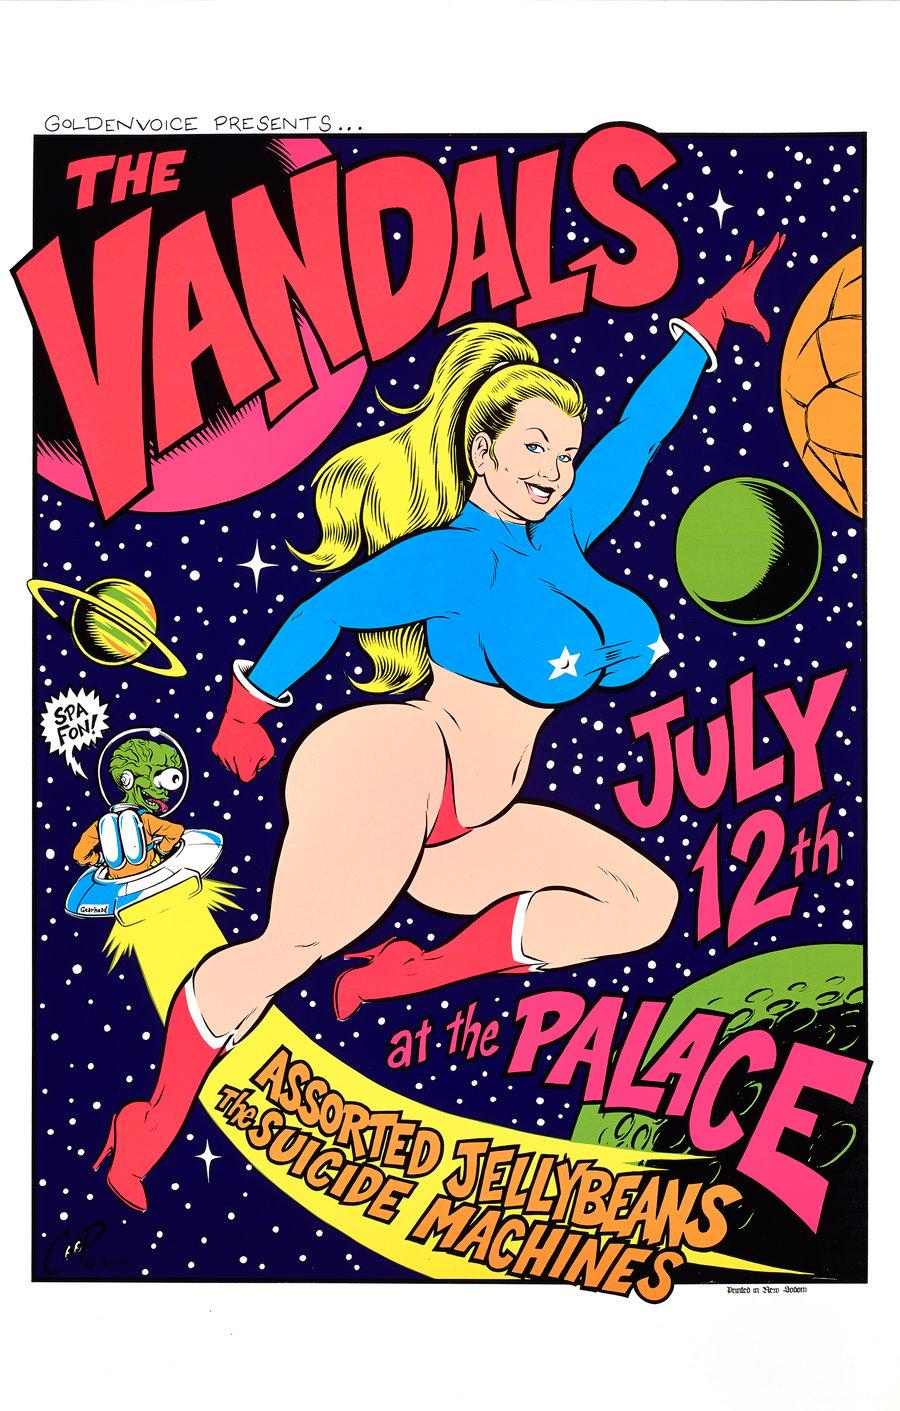 Image of VANDALS vintage silkscreen print